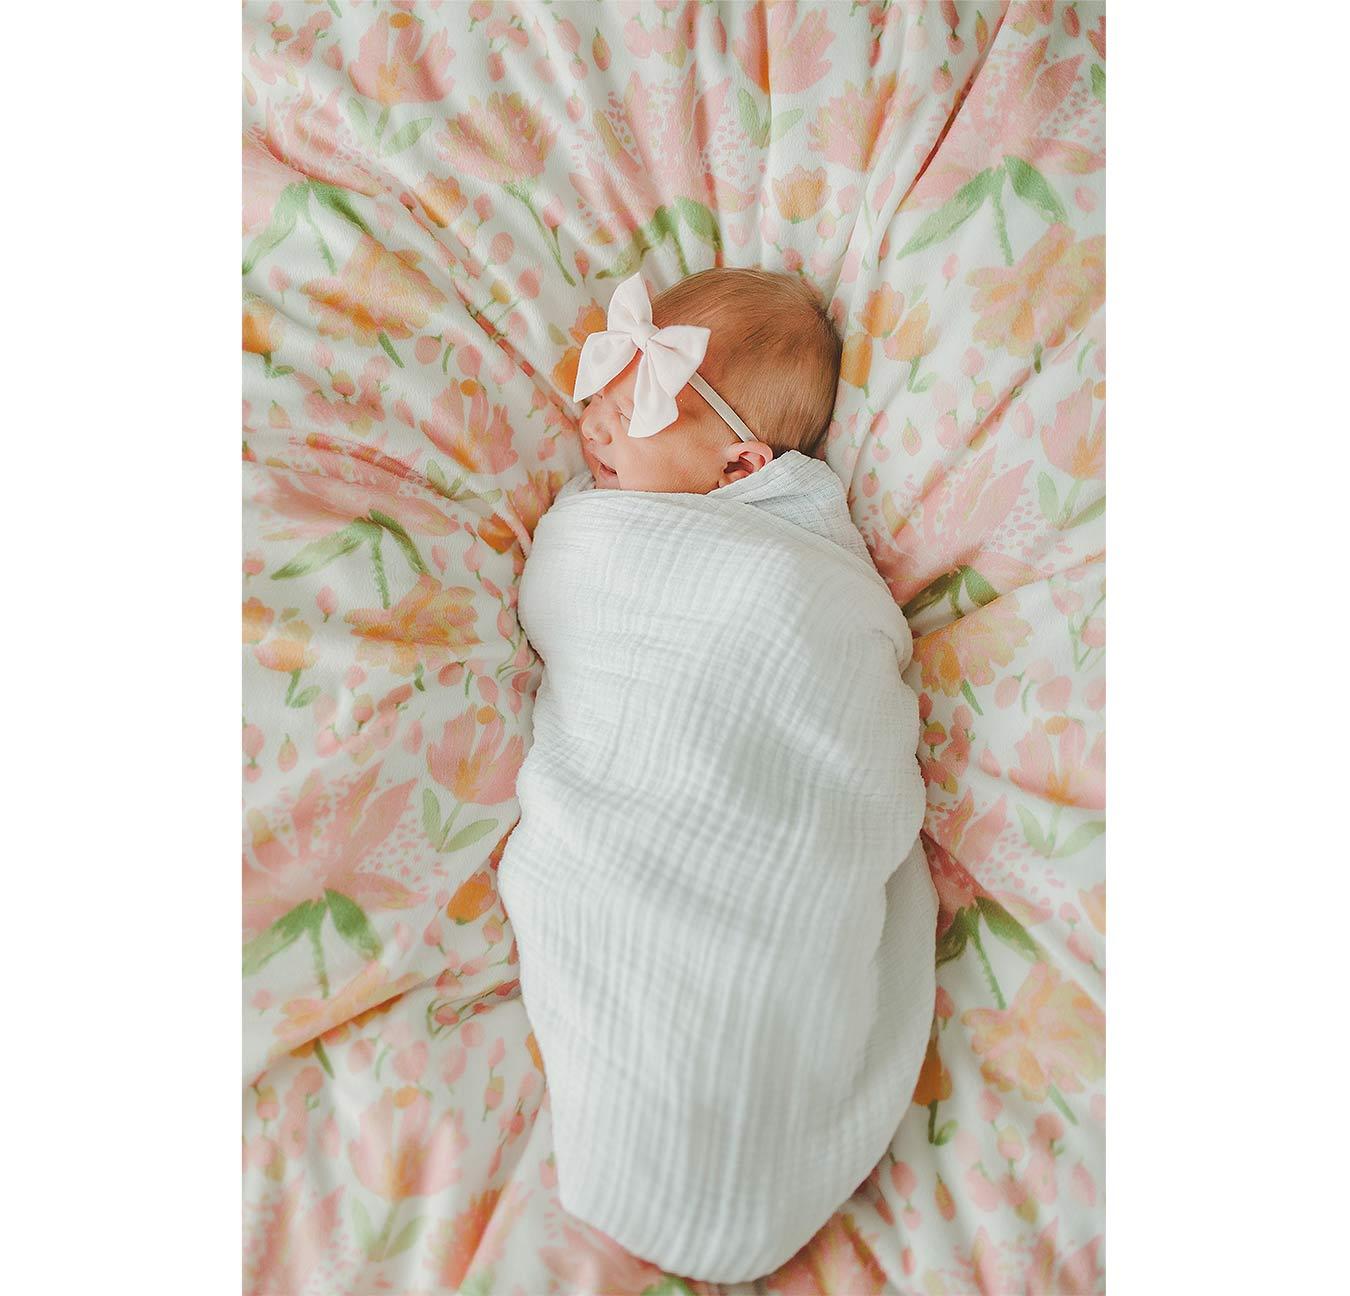 LoganUtahNewbornPhotographer-LifestyleNewbornPhotographyUtah-HeidiRandallStudios-Ellie-GirlNewbornPhotos-26.jpg